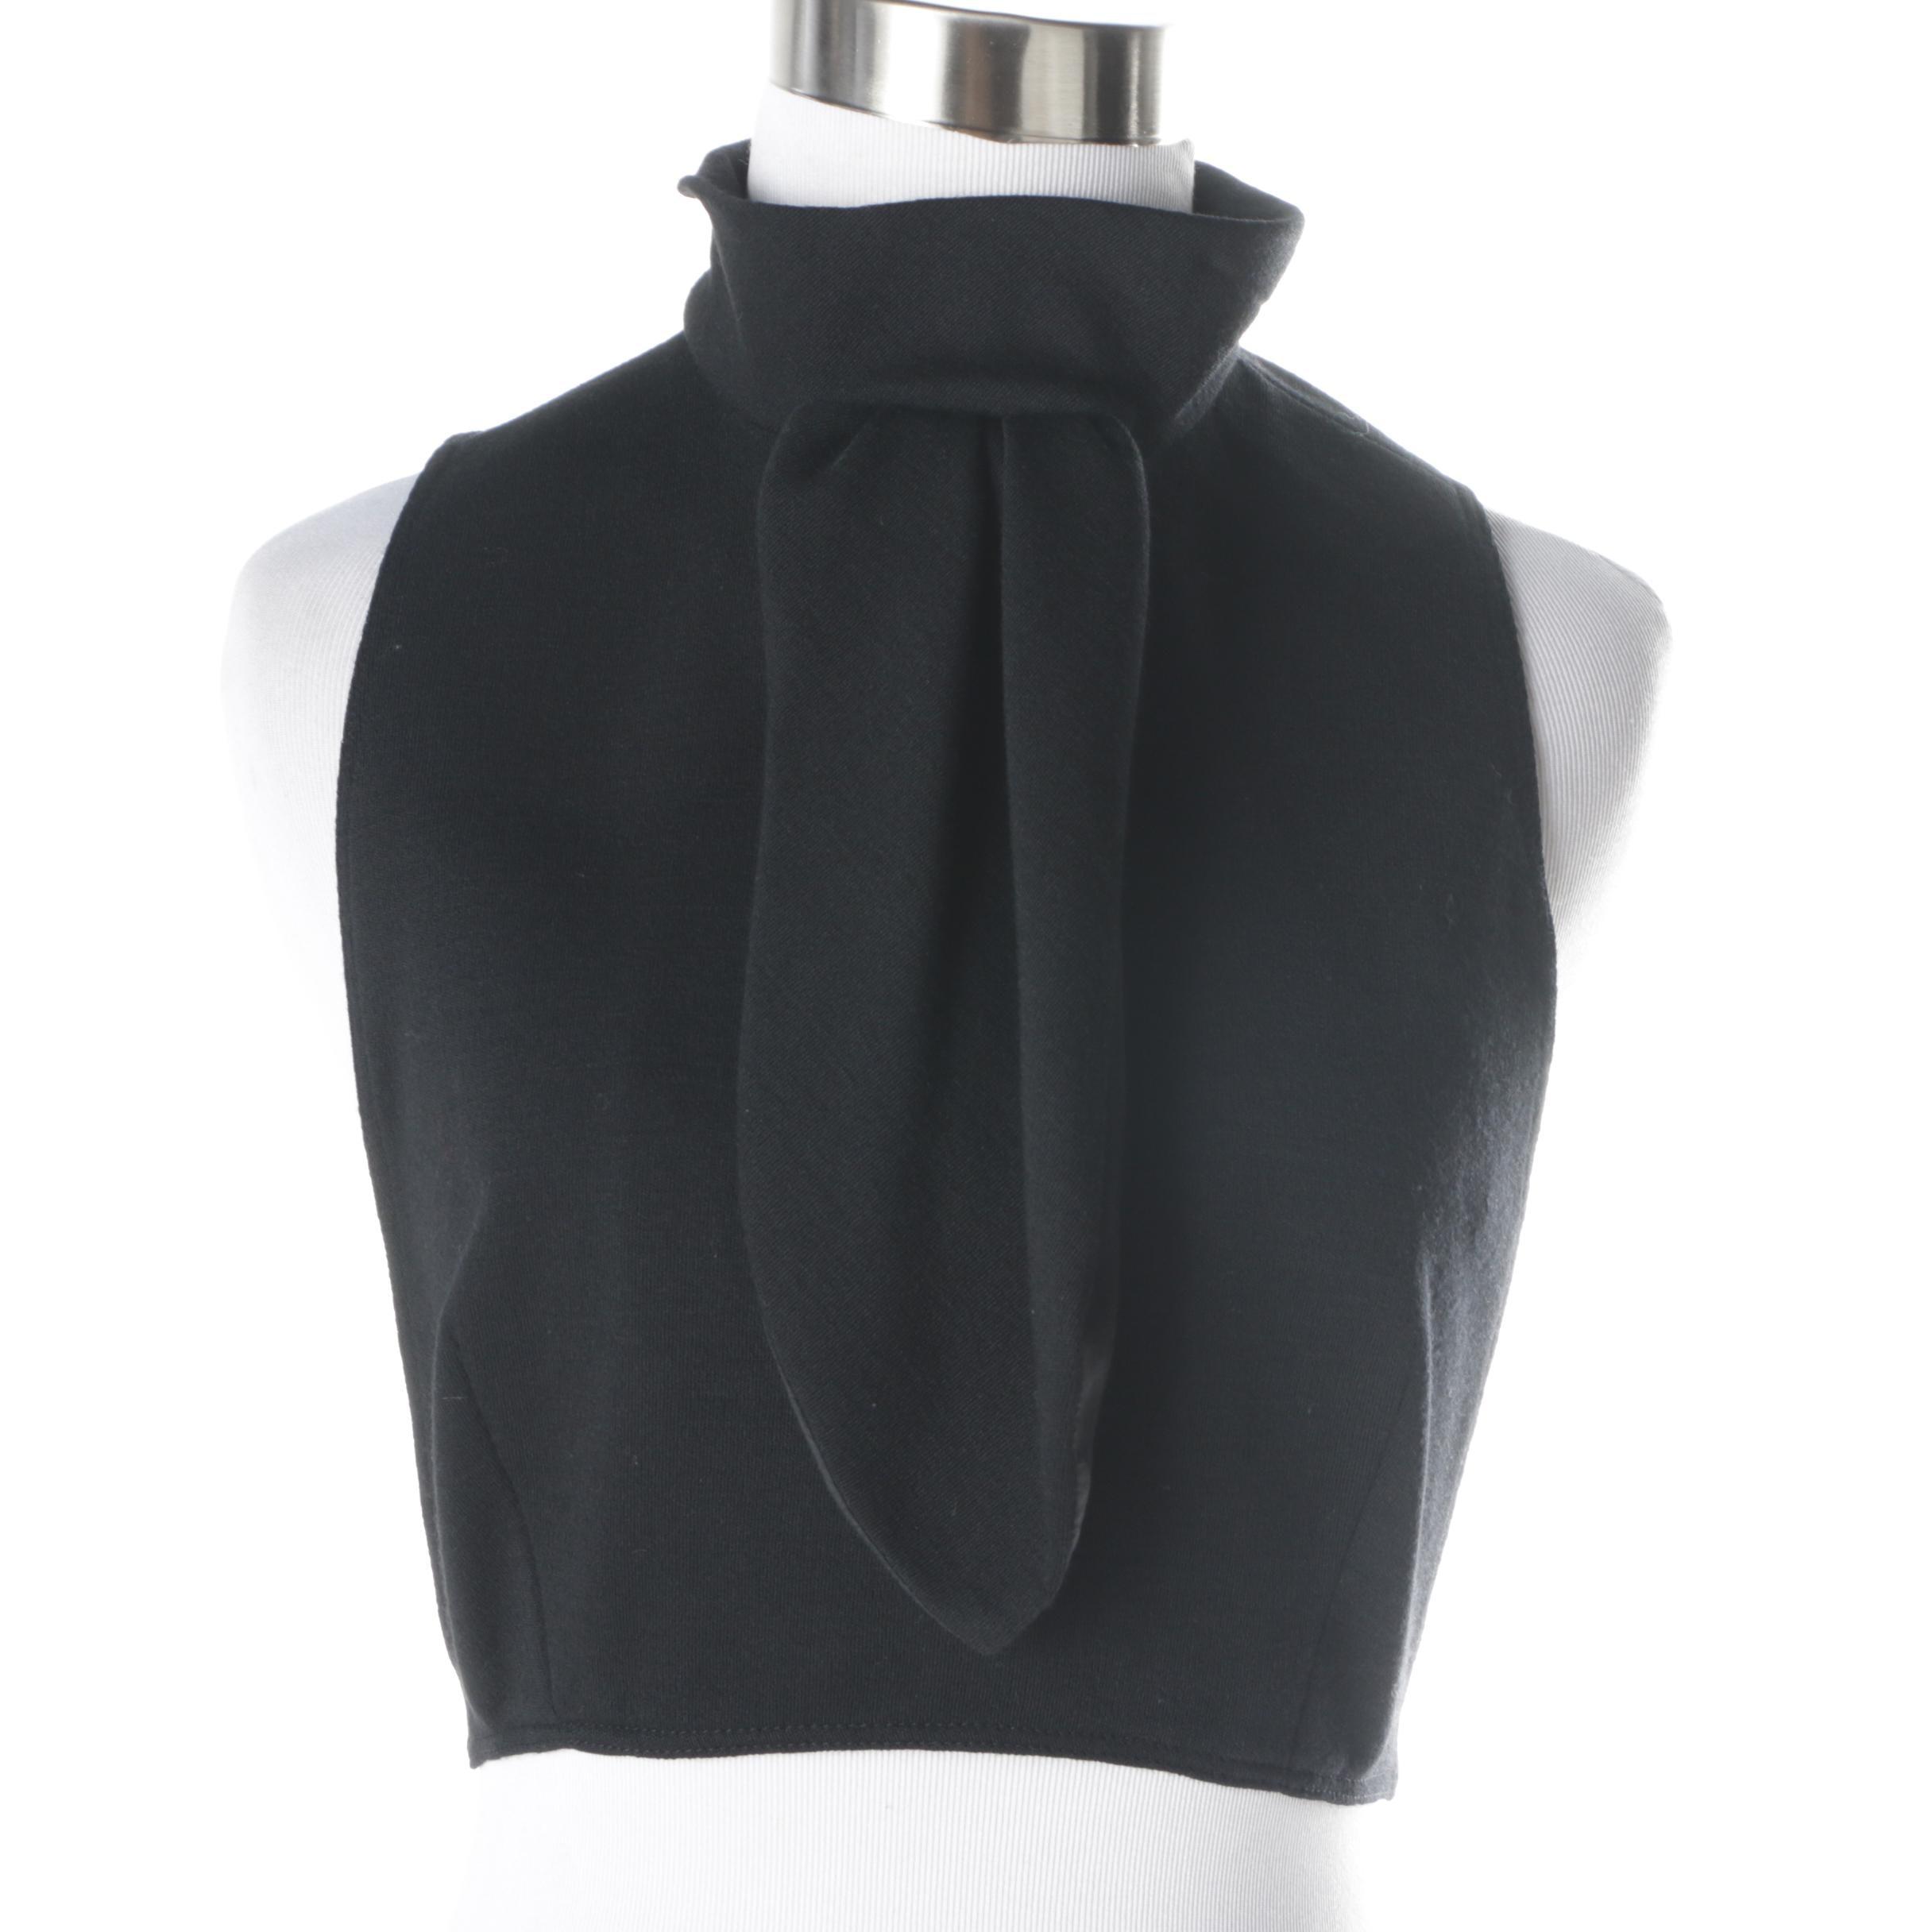 Women's Vintage Cardinali Black Halter Top